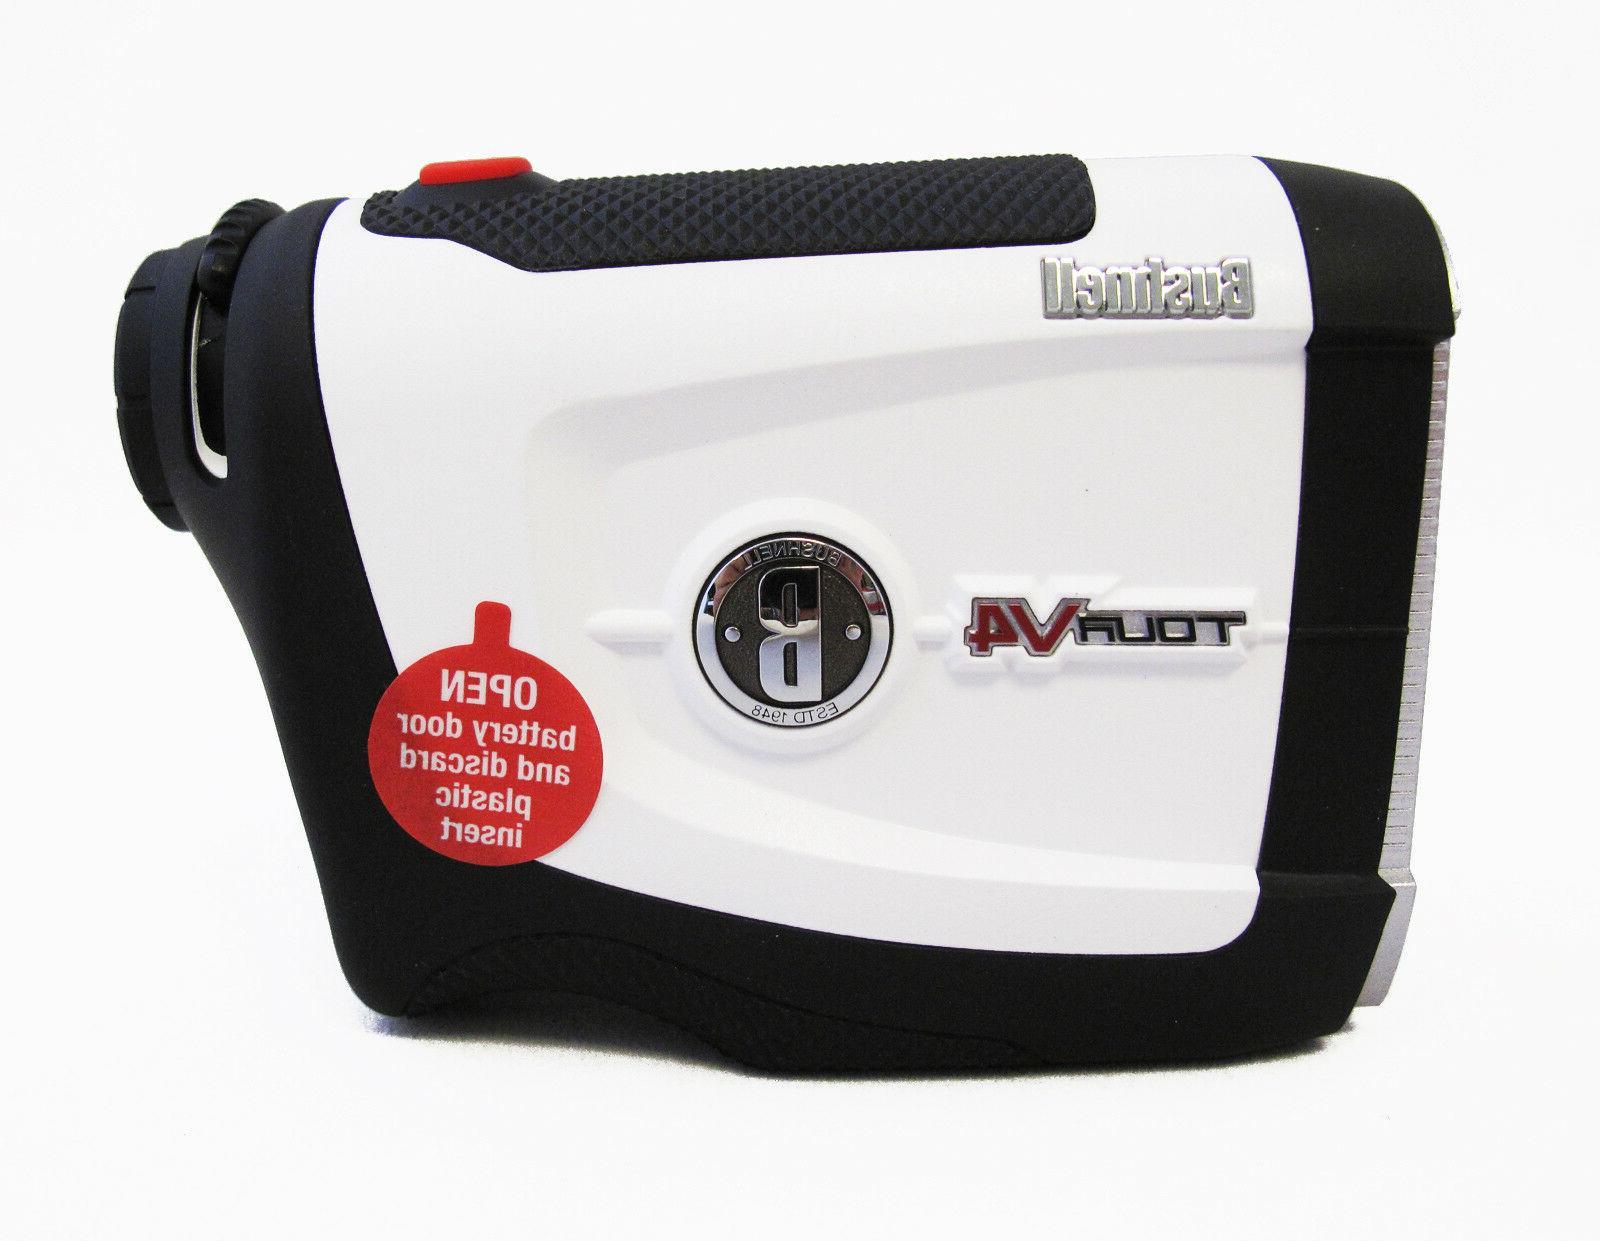 Brand Bushnell V4 Pack Rangefinder Jolt Technology